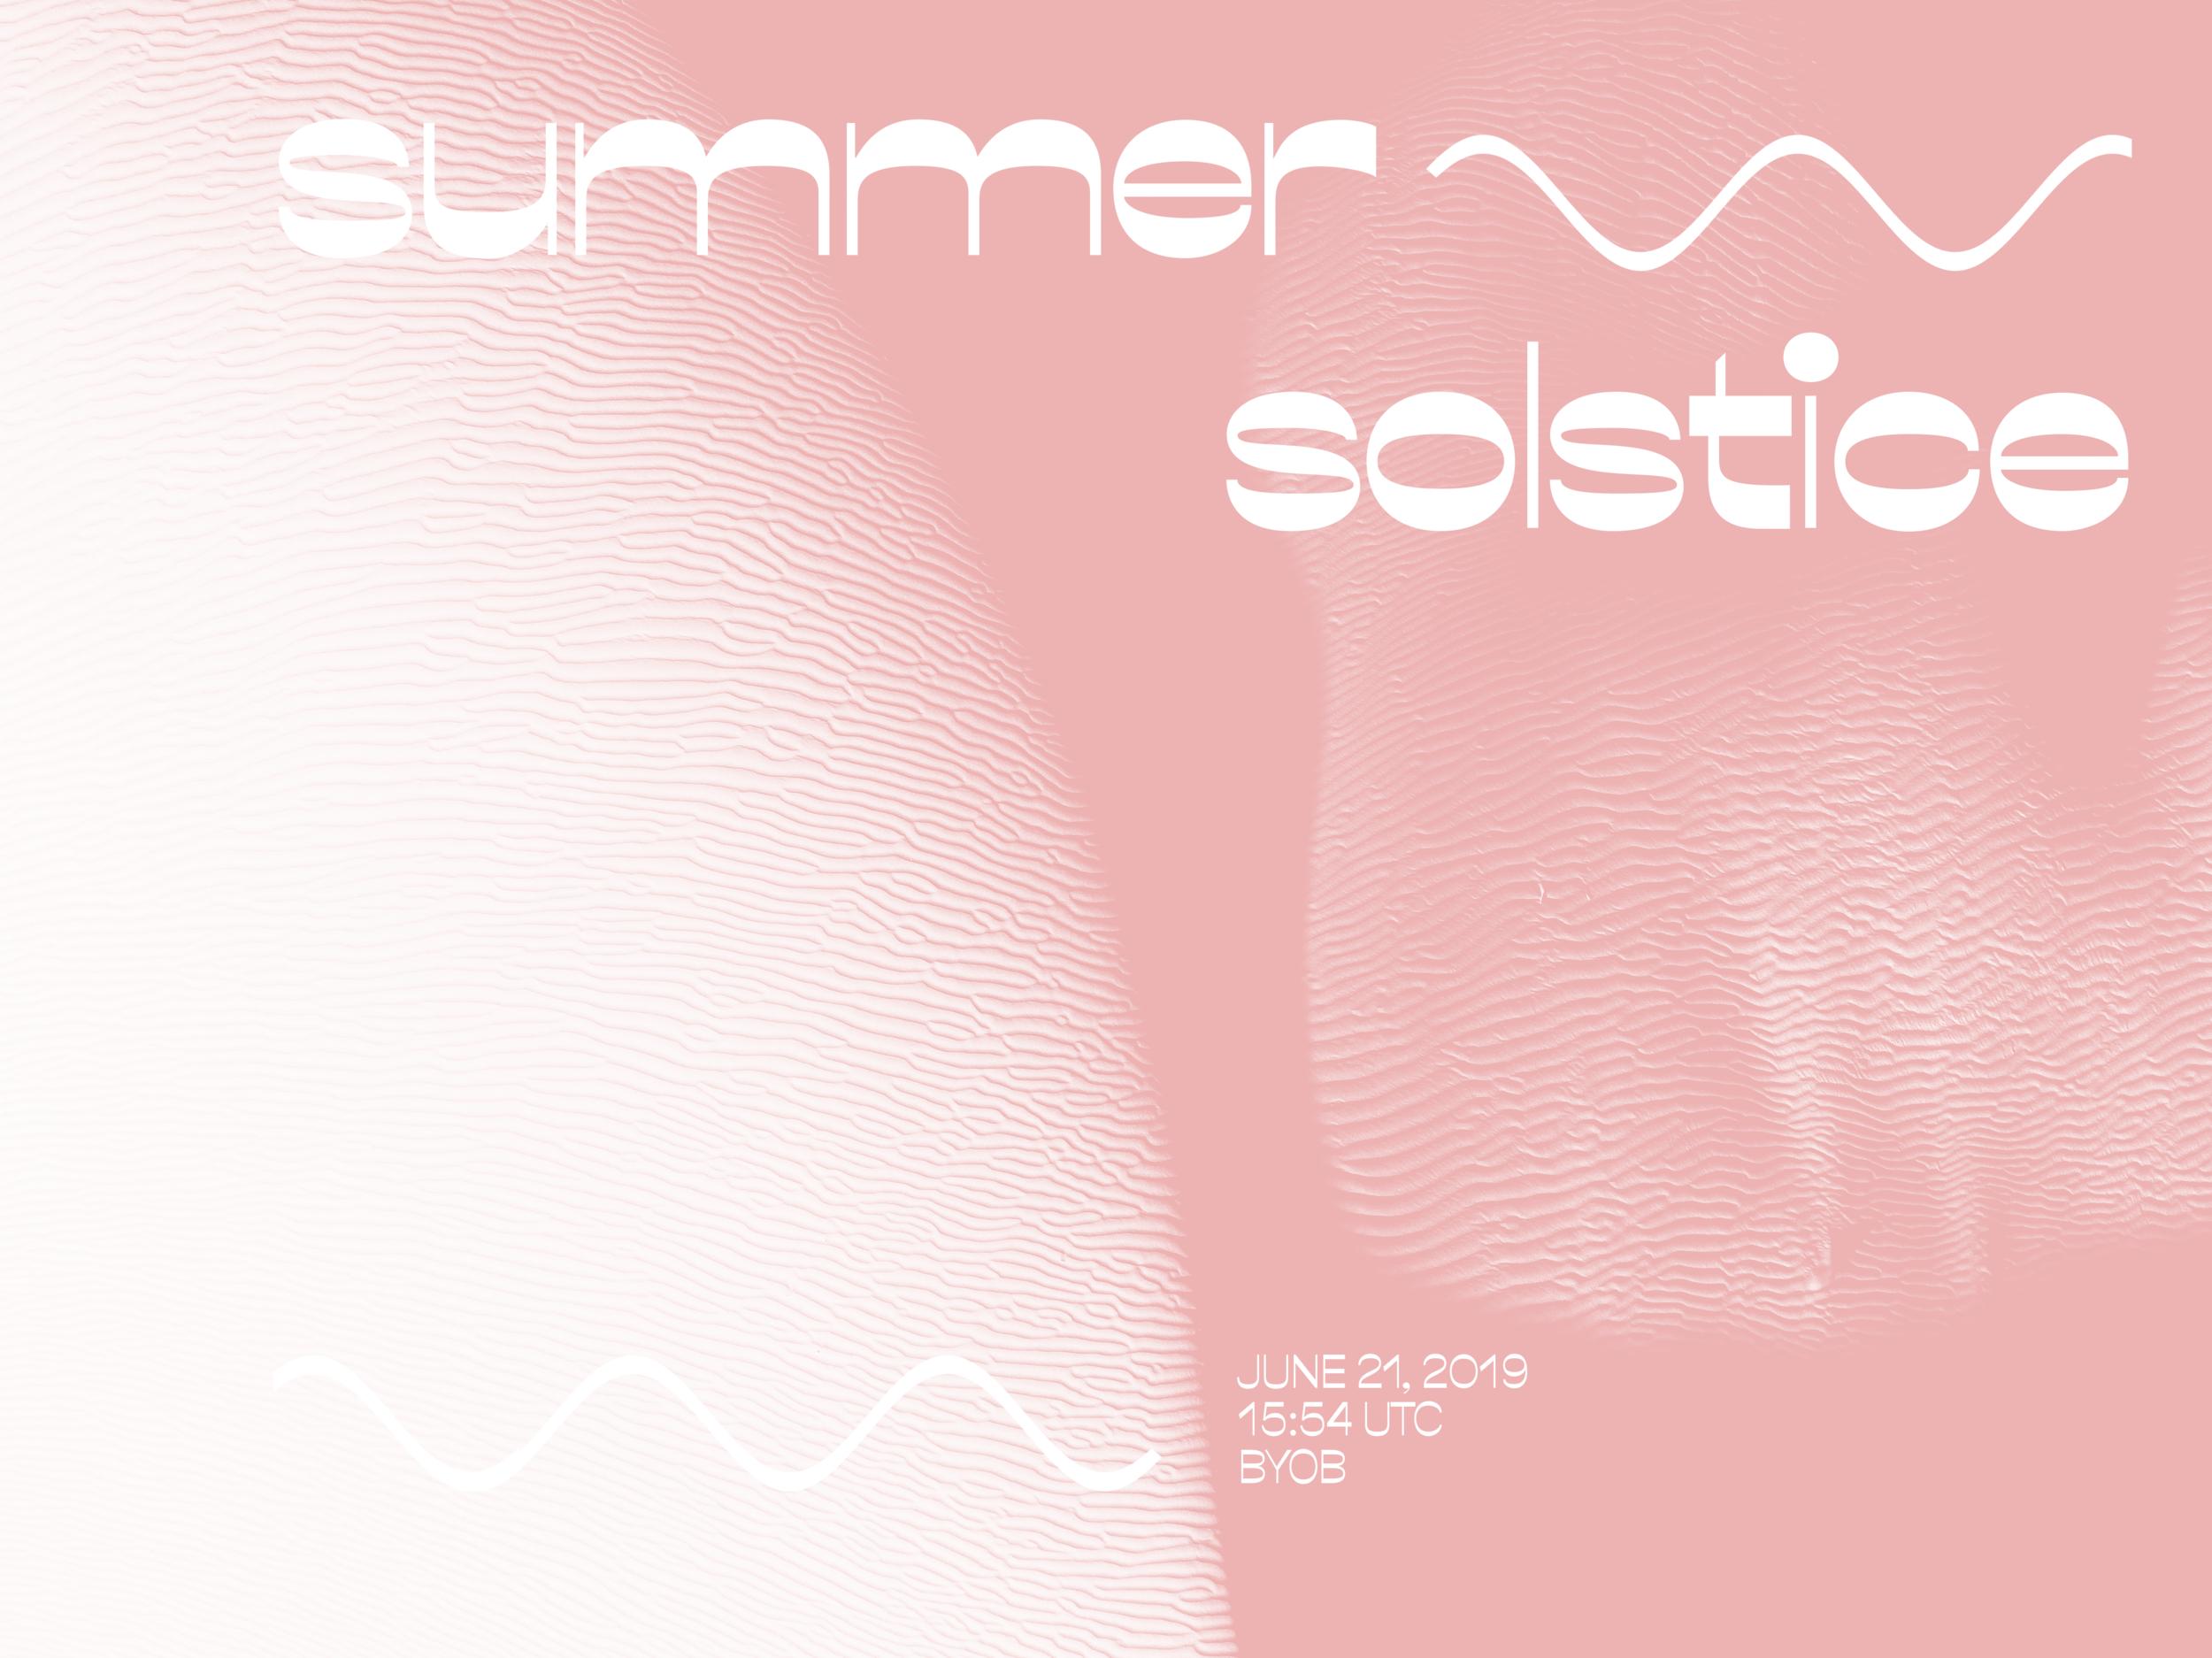 summersolstice.png